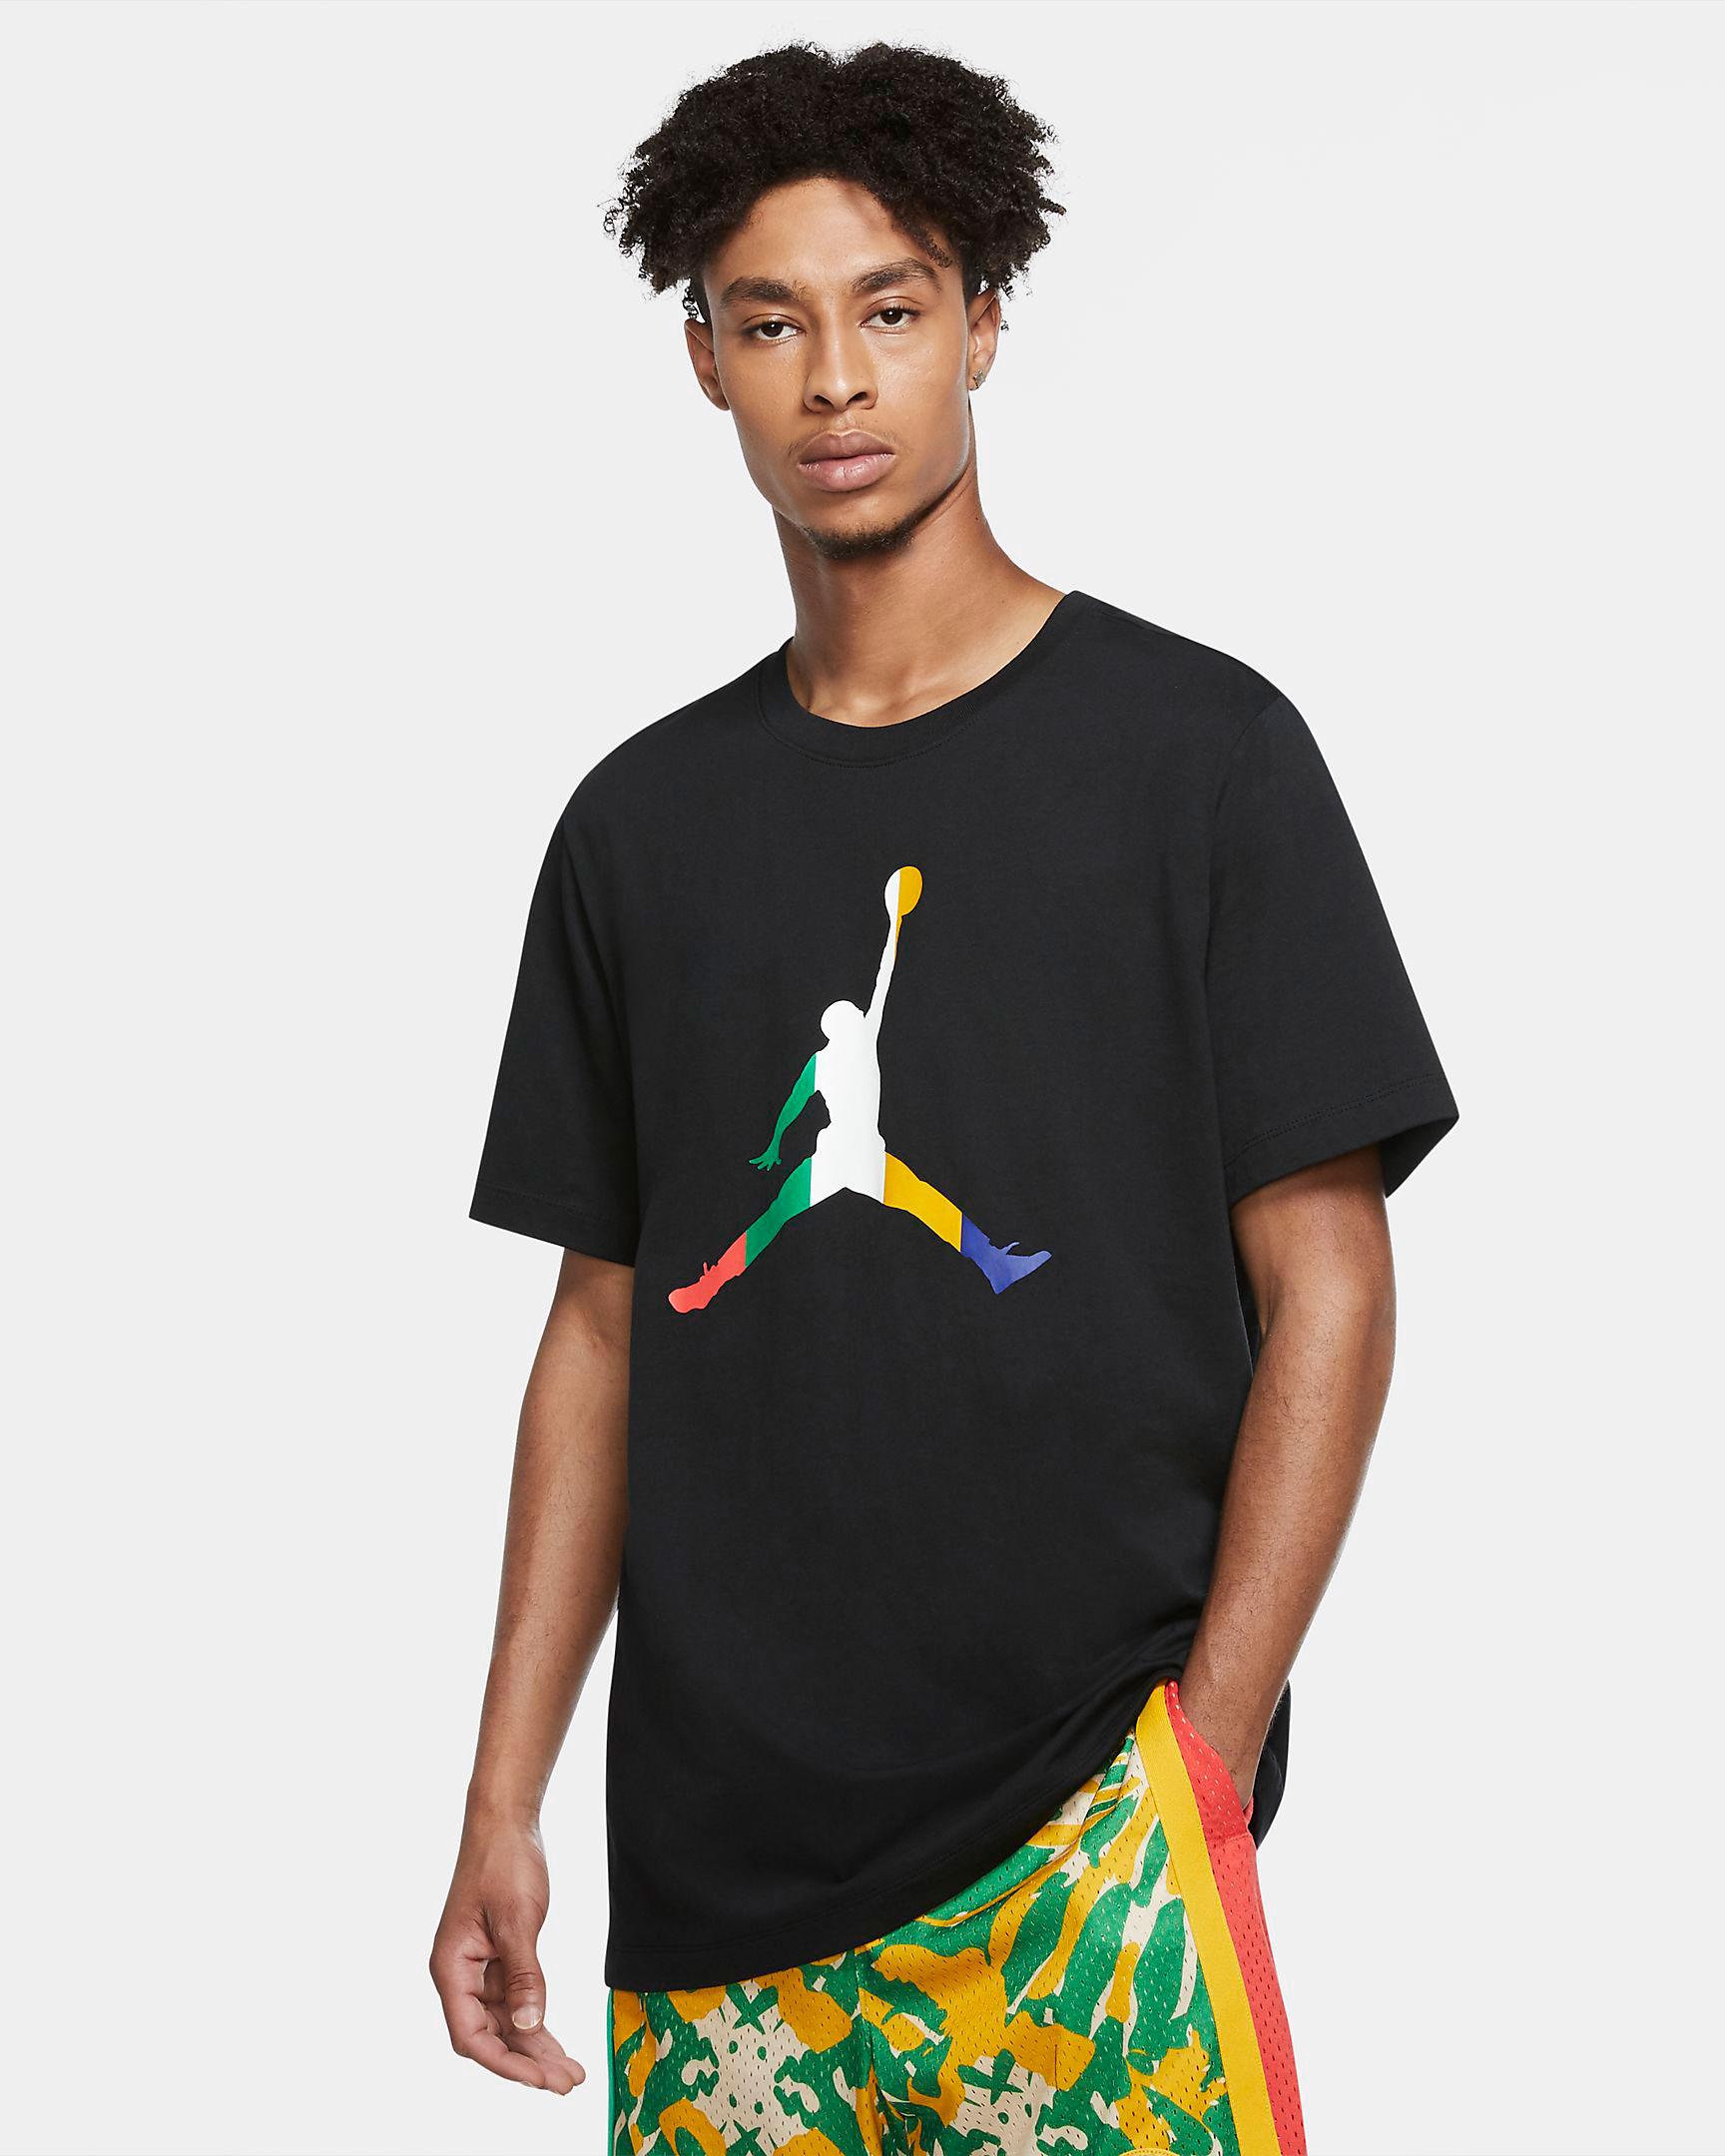 jordan-sport-dna-jumpman-shirt-black-multi-color-1